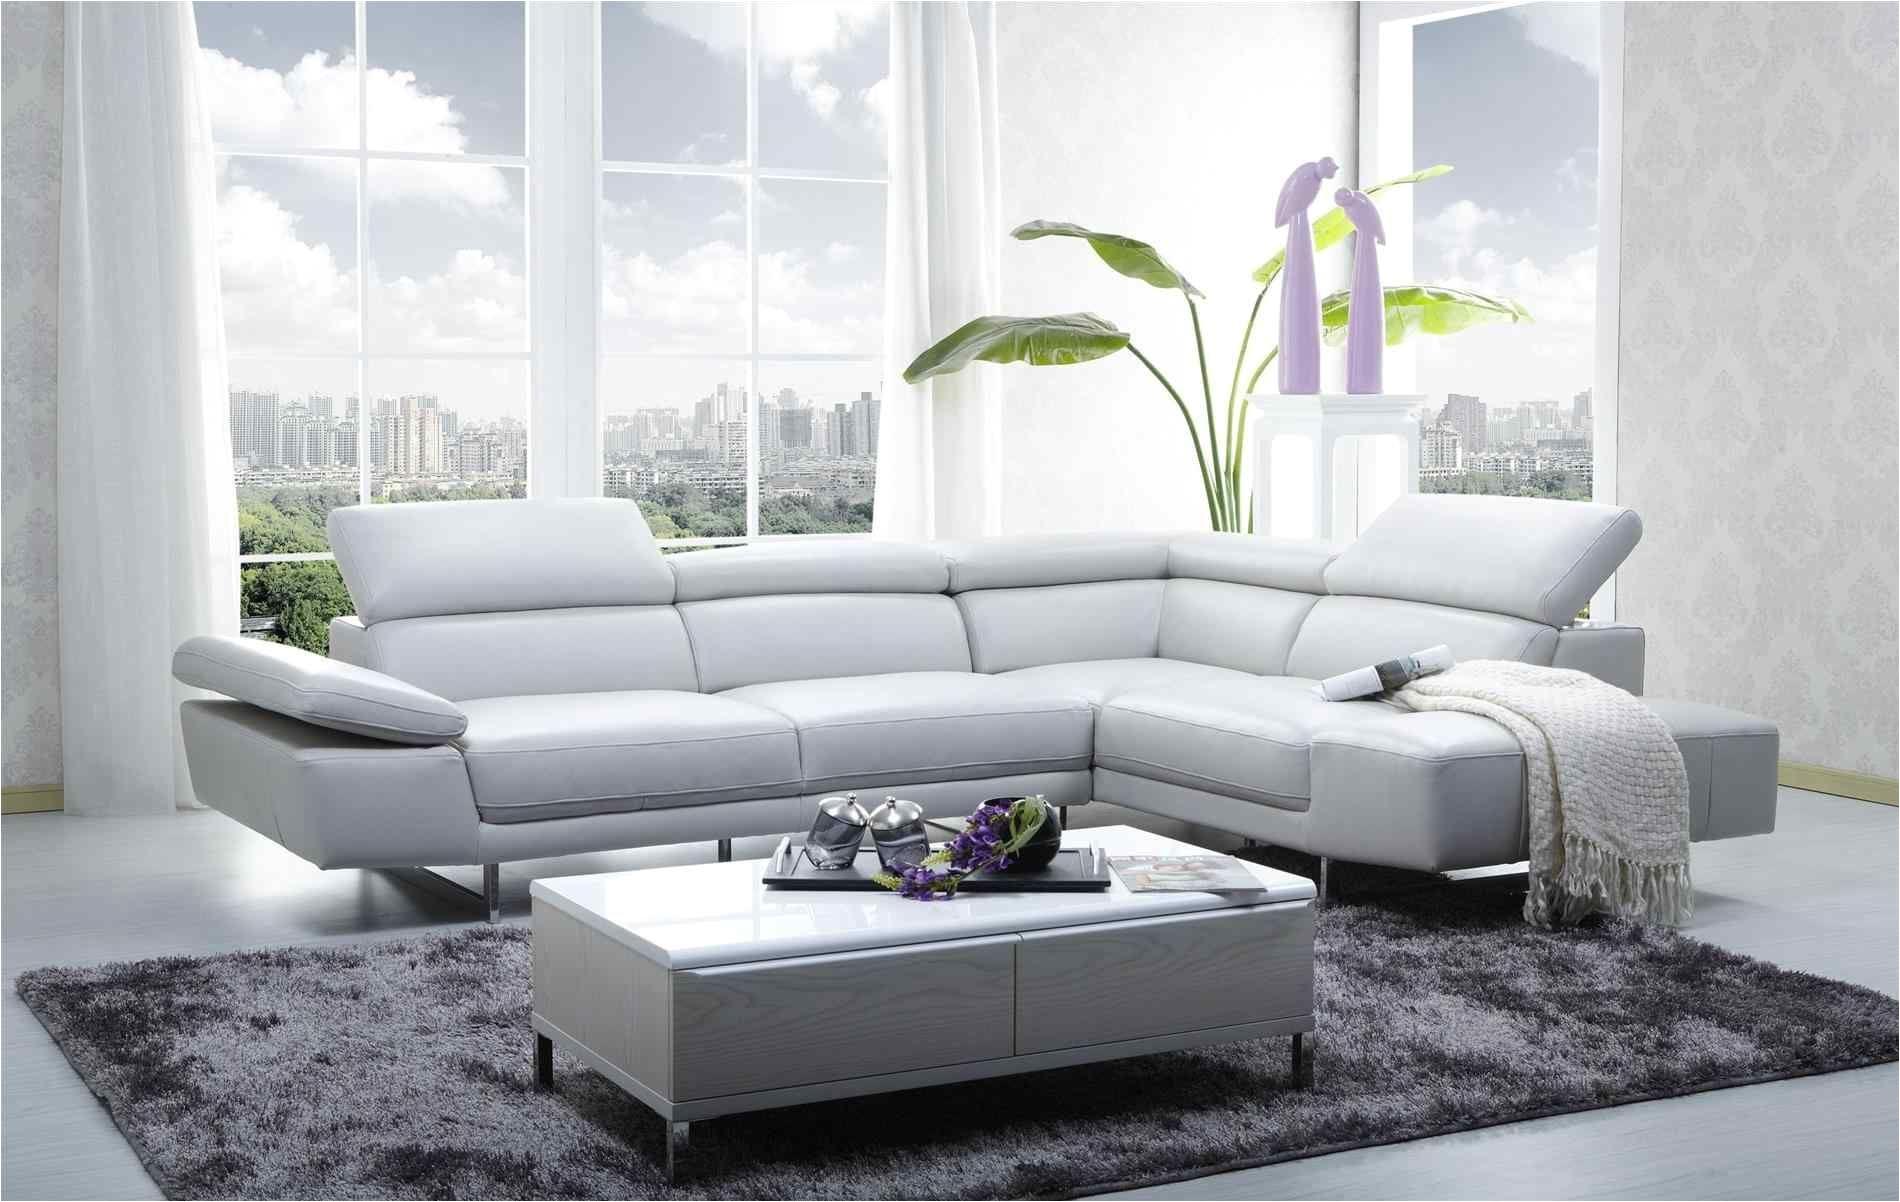 suns furniture tulsa unique 11 best contemporary furniture tulsa ideas for living room